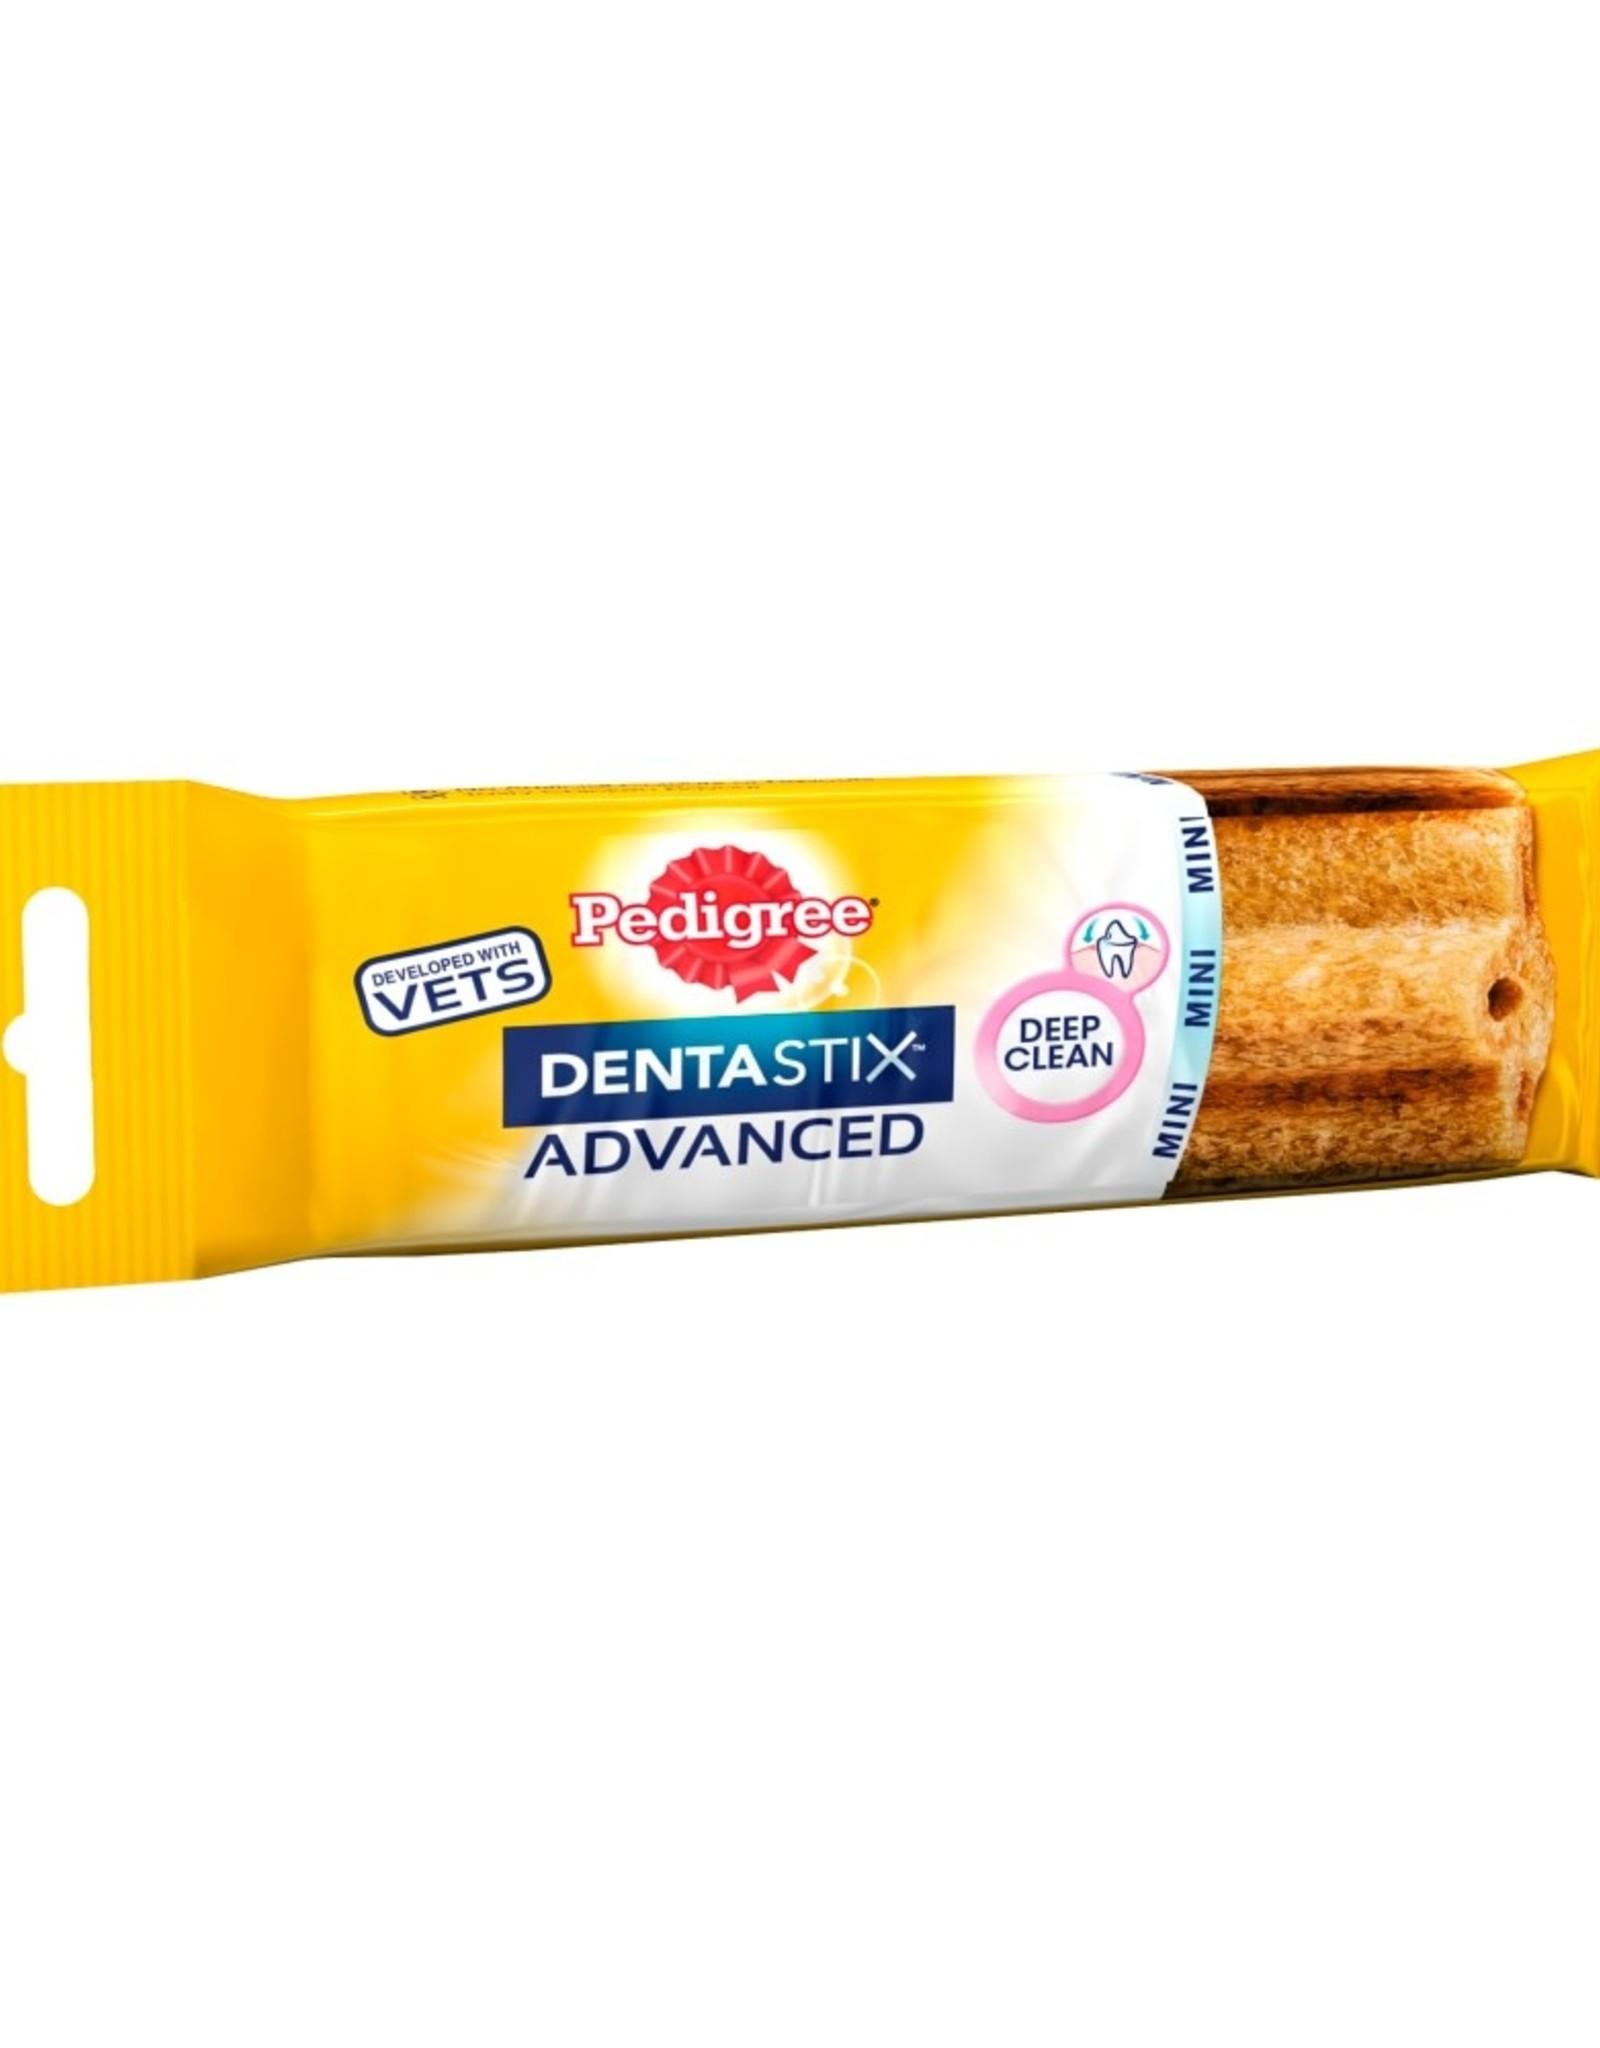 Pedigree Dentastix Advanced Low Fat Mini Small and Medium Dog Dental Treat with Chicken, 40g